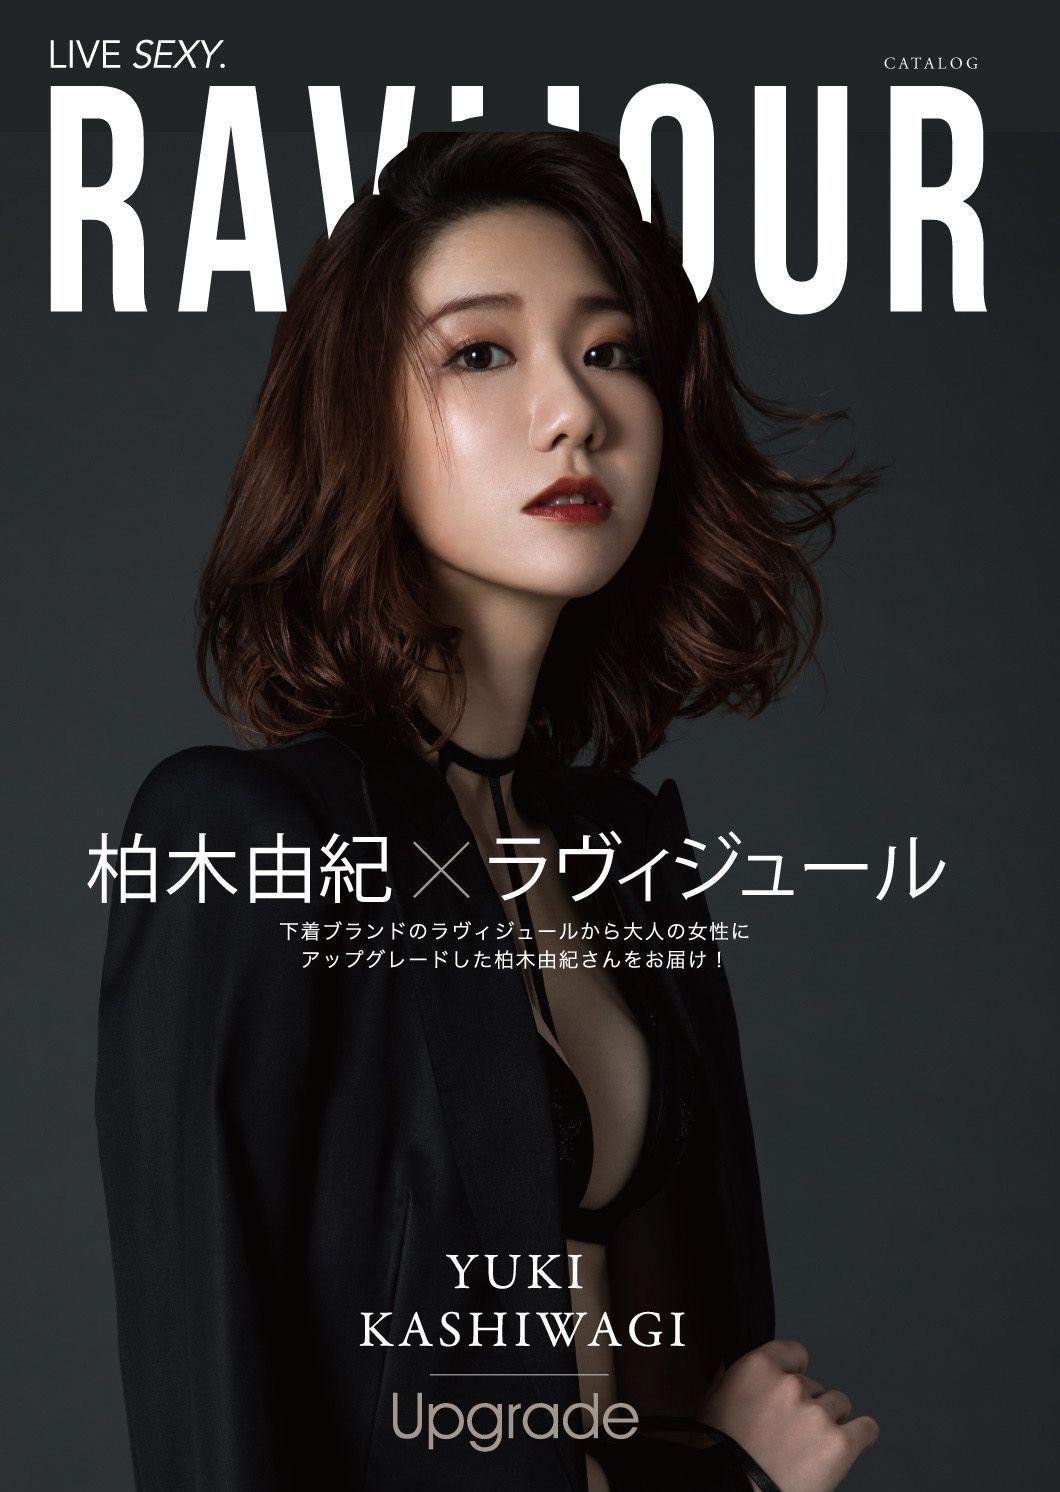 Kashiwagi Yuki 柏木由紀, Ravijour.com Upgrade (アップグレード) 2018